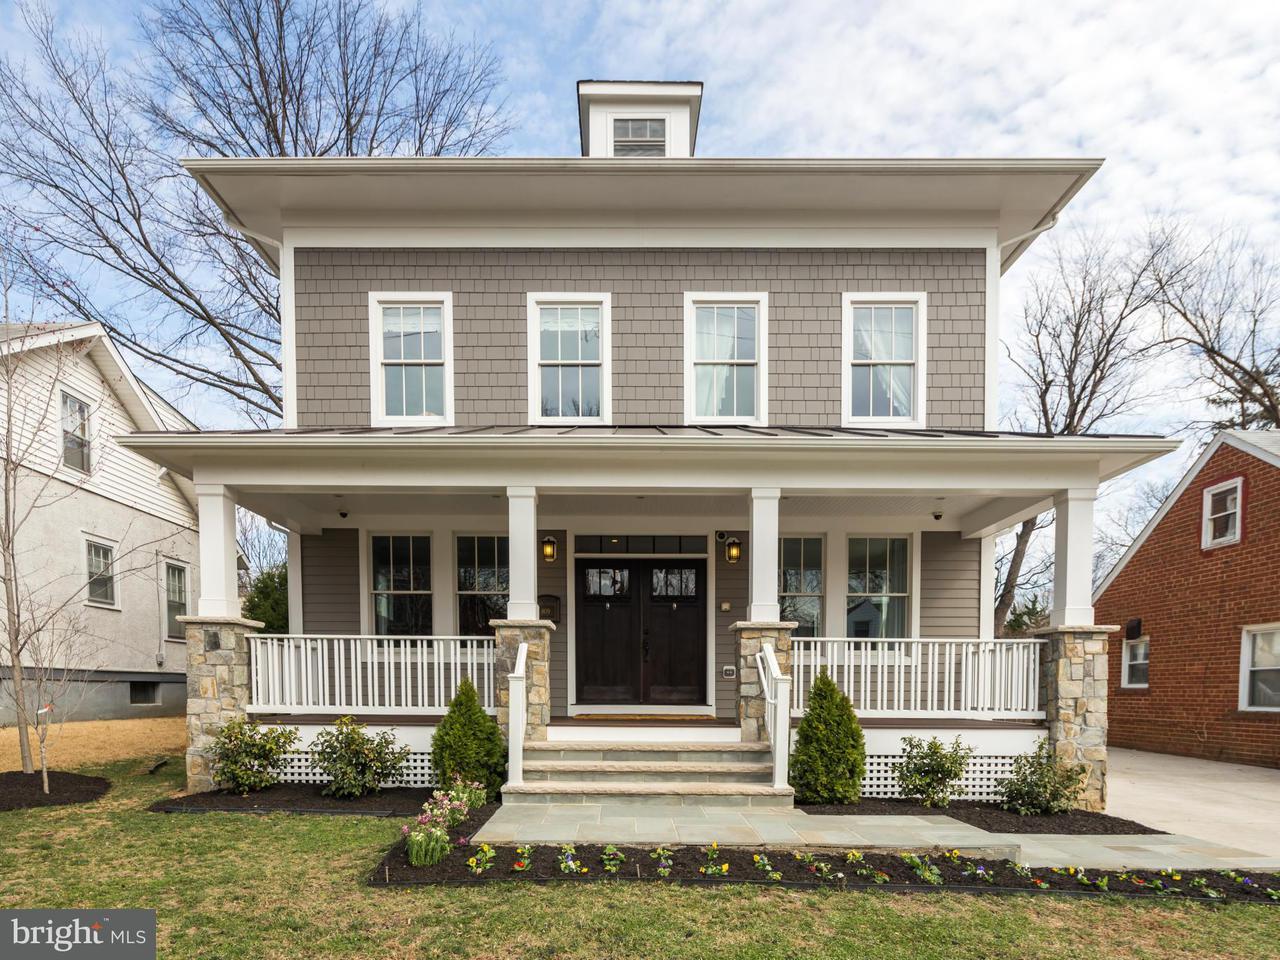 Single Family Home for Sale at 809 HIGHLAND ST N 809 HIGHLAND ST N Arlington, Virginia 22201 United States